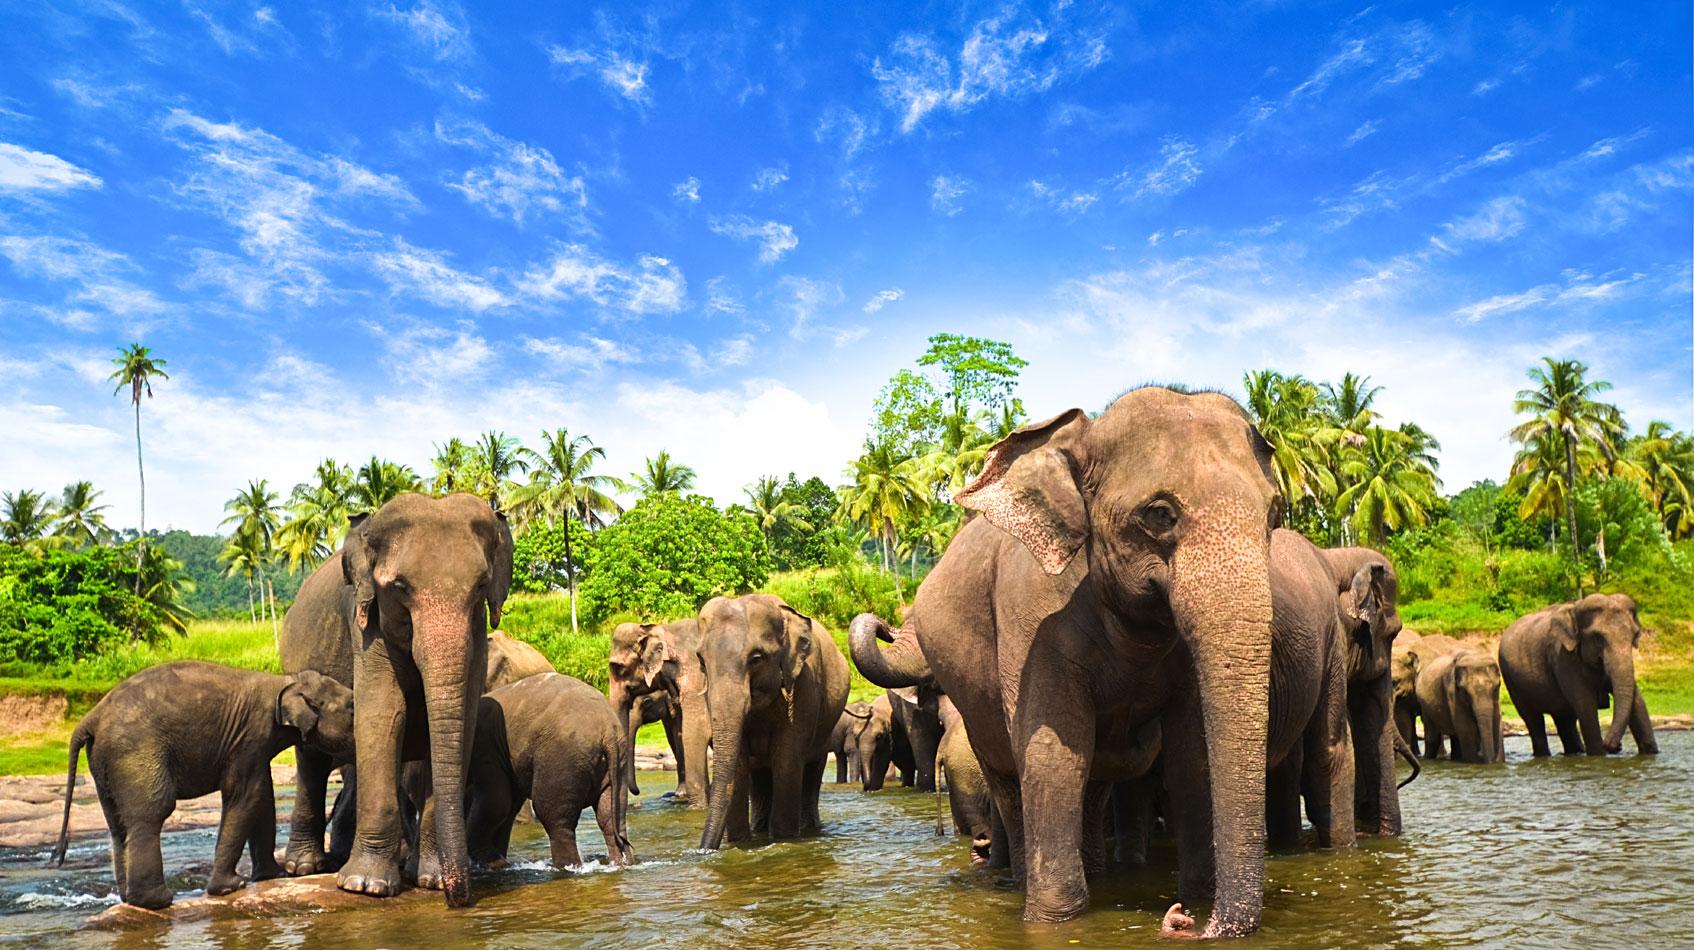 Sri-Lanka-Elephants-©-Surangaw---iStock